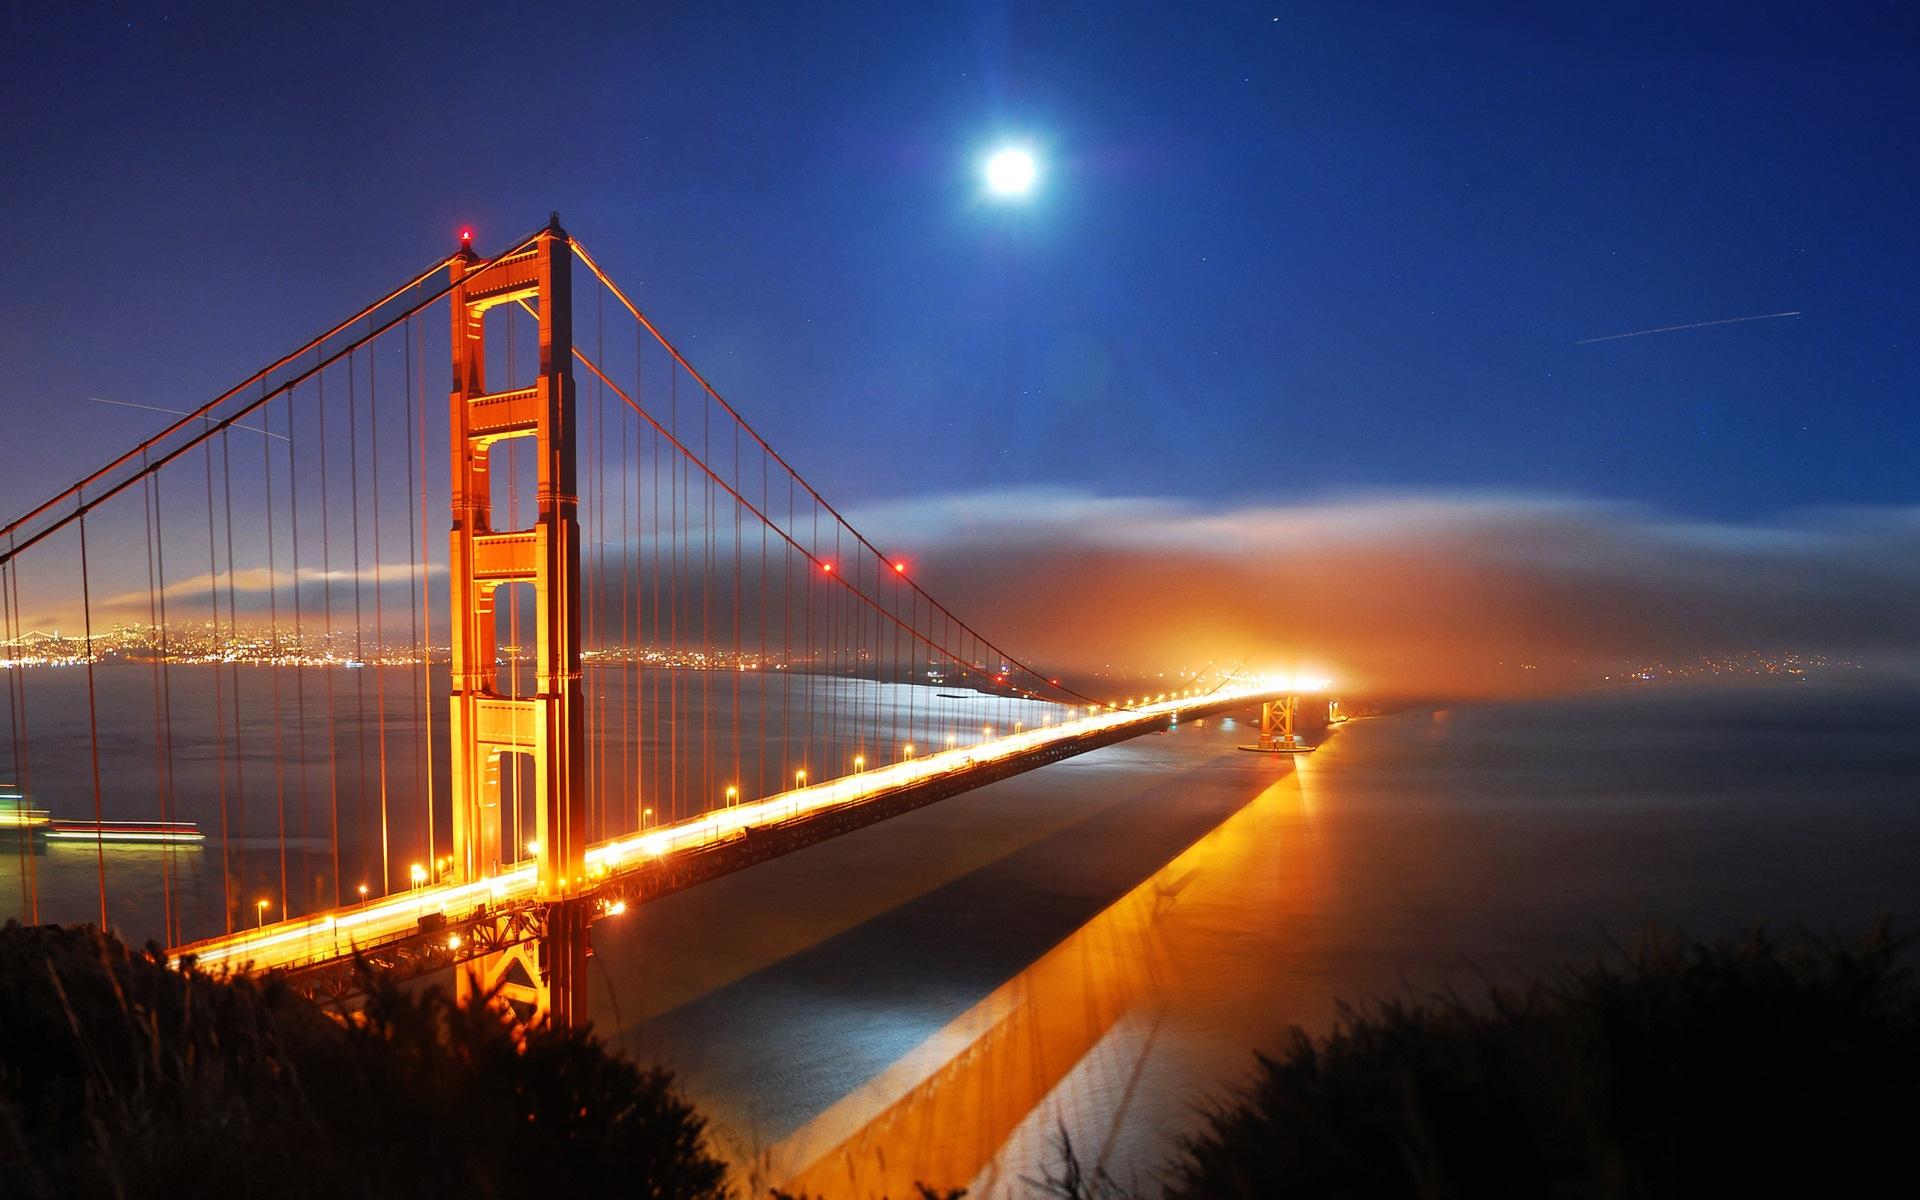 San Francisco Bridge Night Lights wallpaper